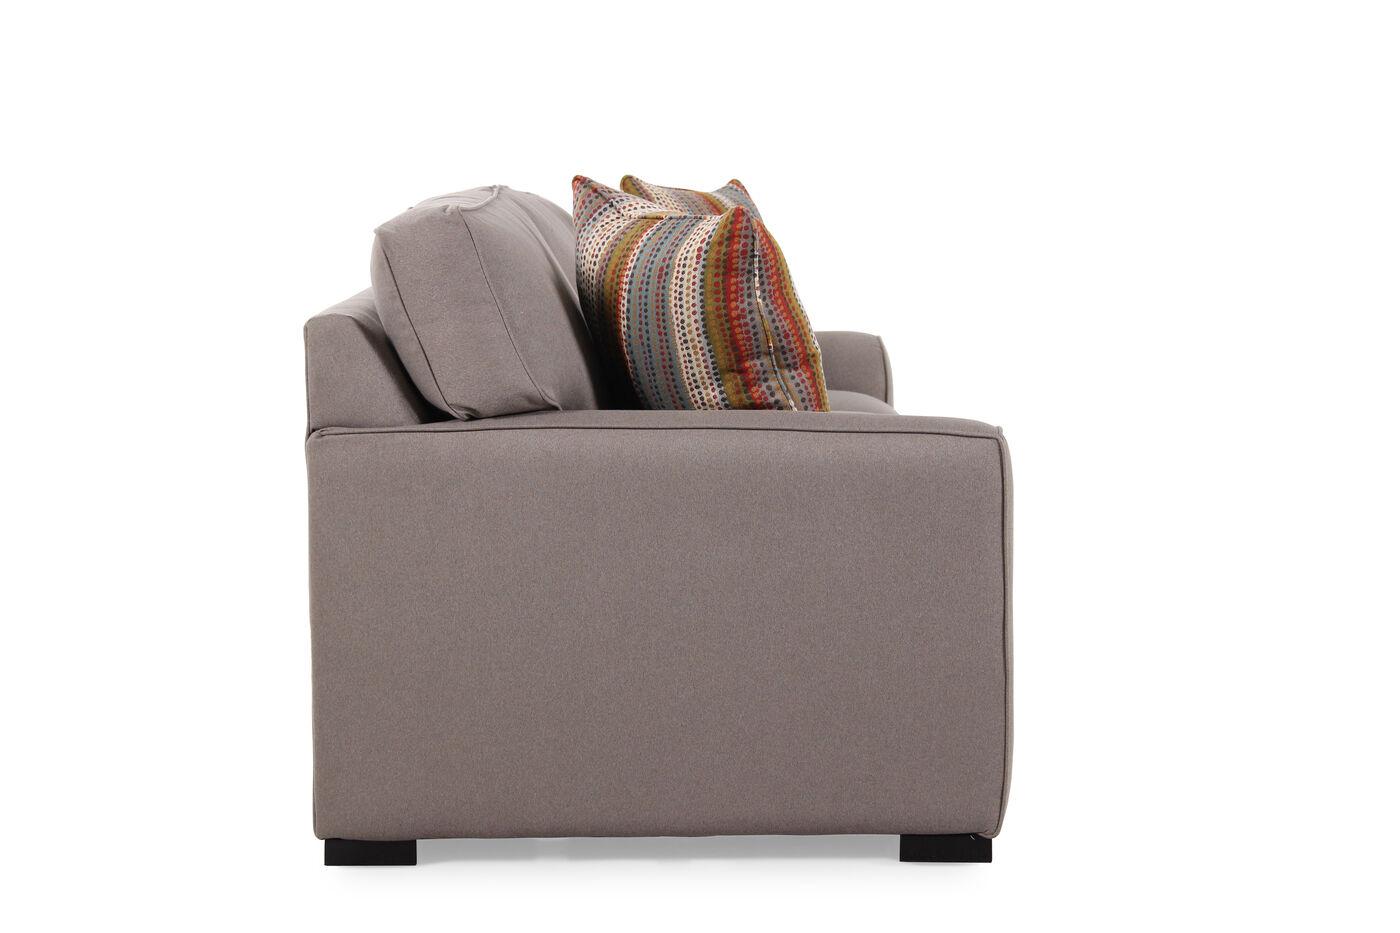 Jonathan Louis Queen Memory Foam Sleeper Sofa | Mathis ...